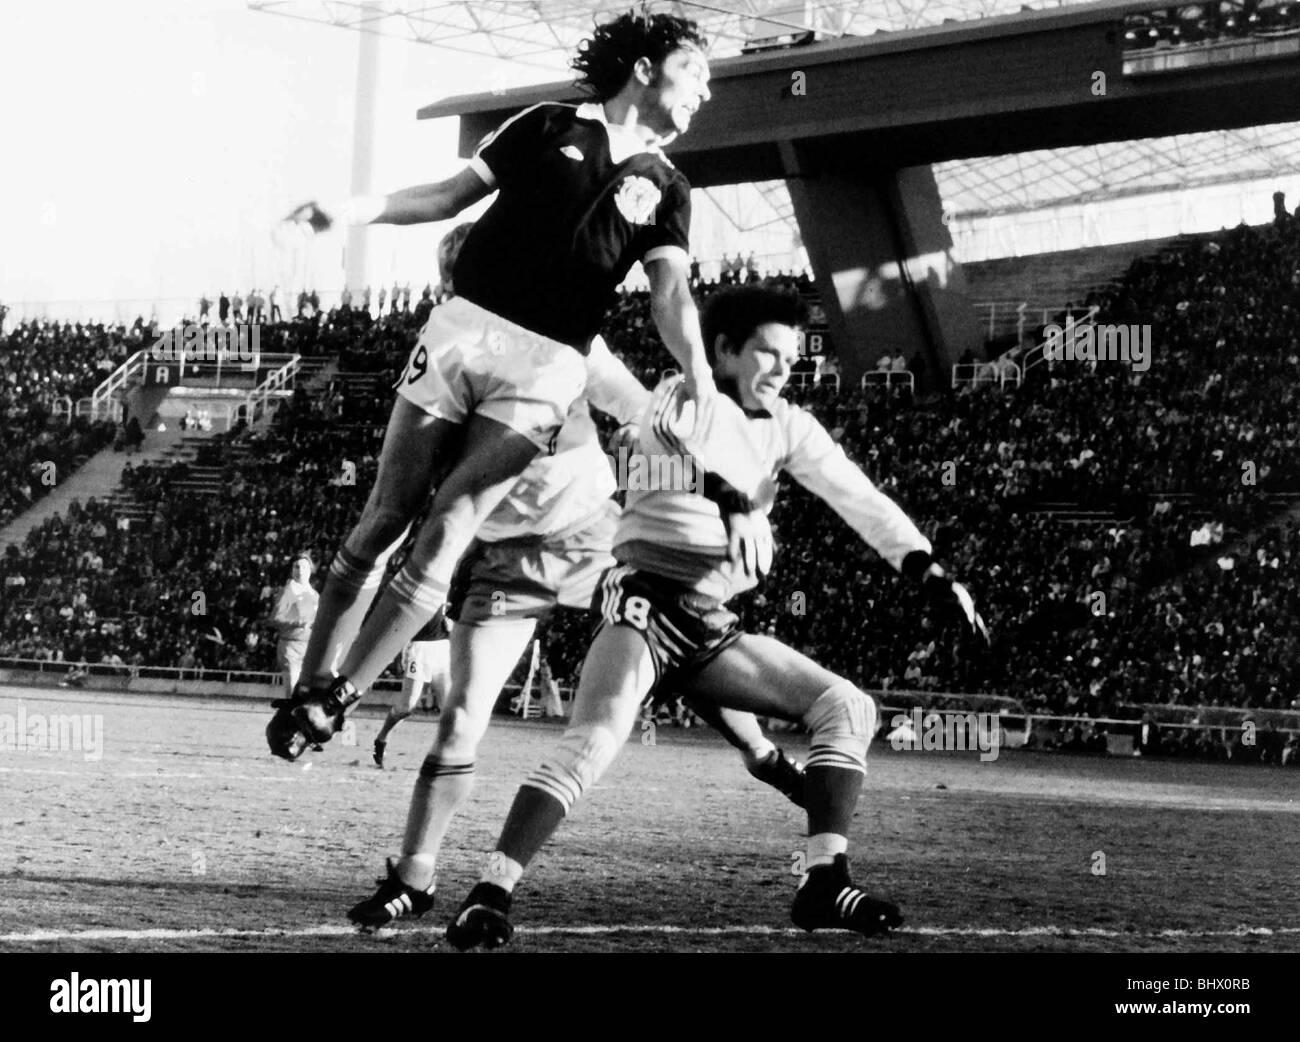 Football World Cup 1978 Scotland 3 Holland 2 in Mendoza Joe Jordan (Scotland) and Jongbloed - Stock Image